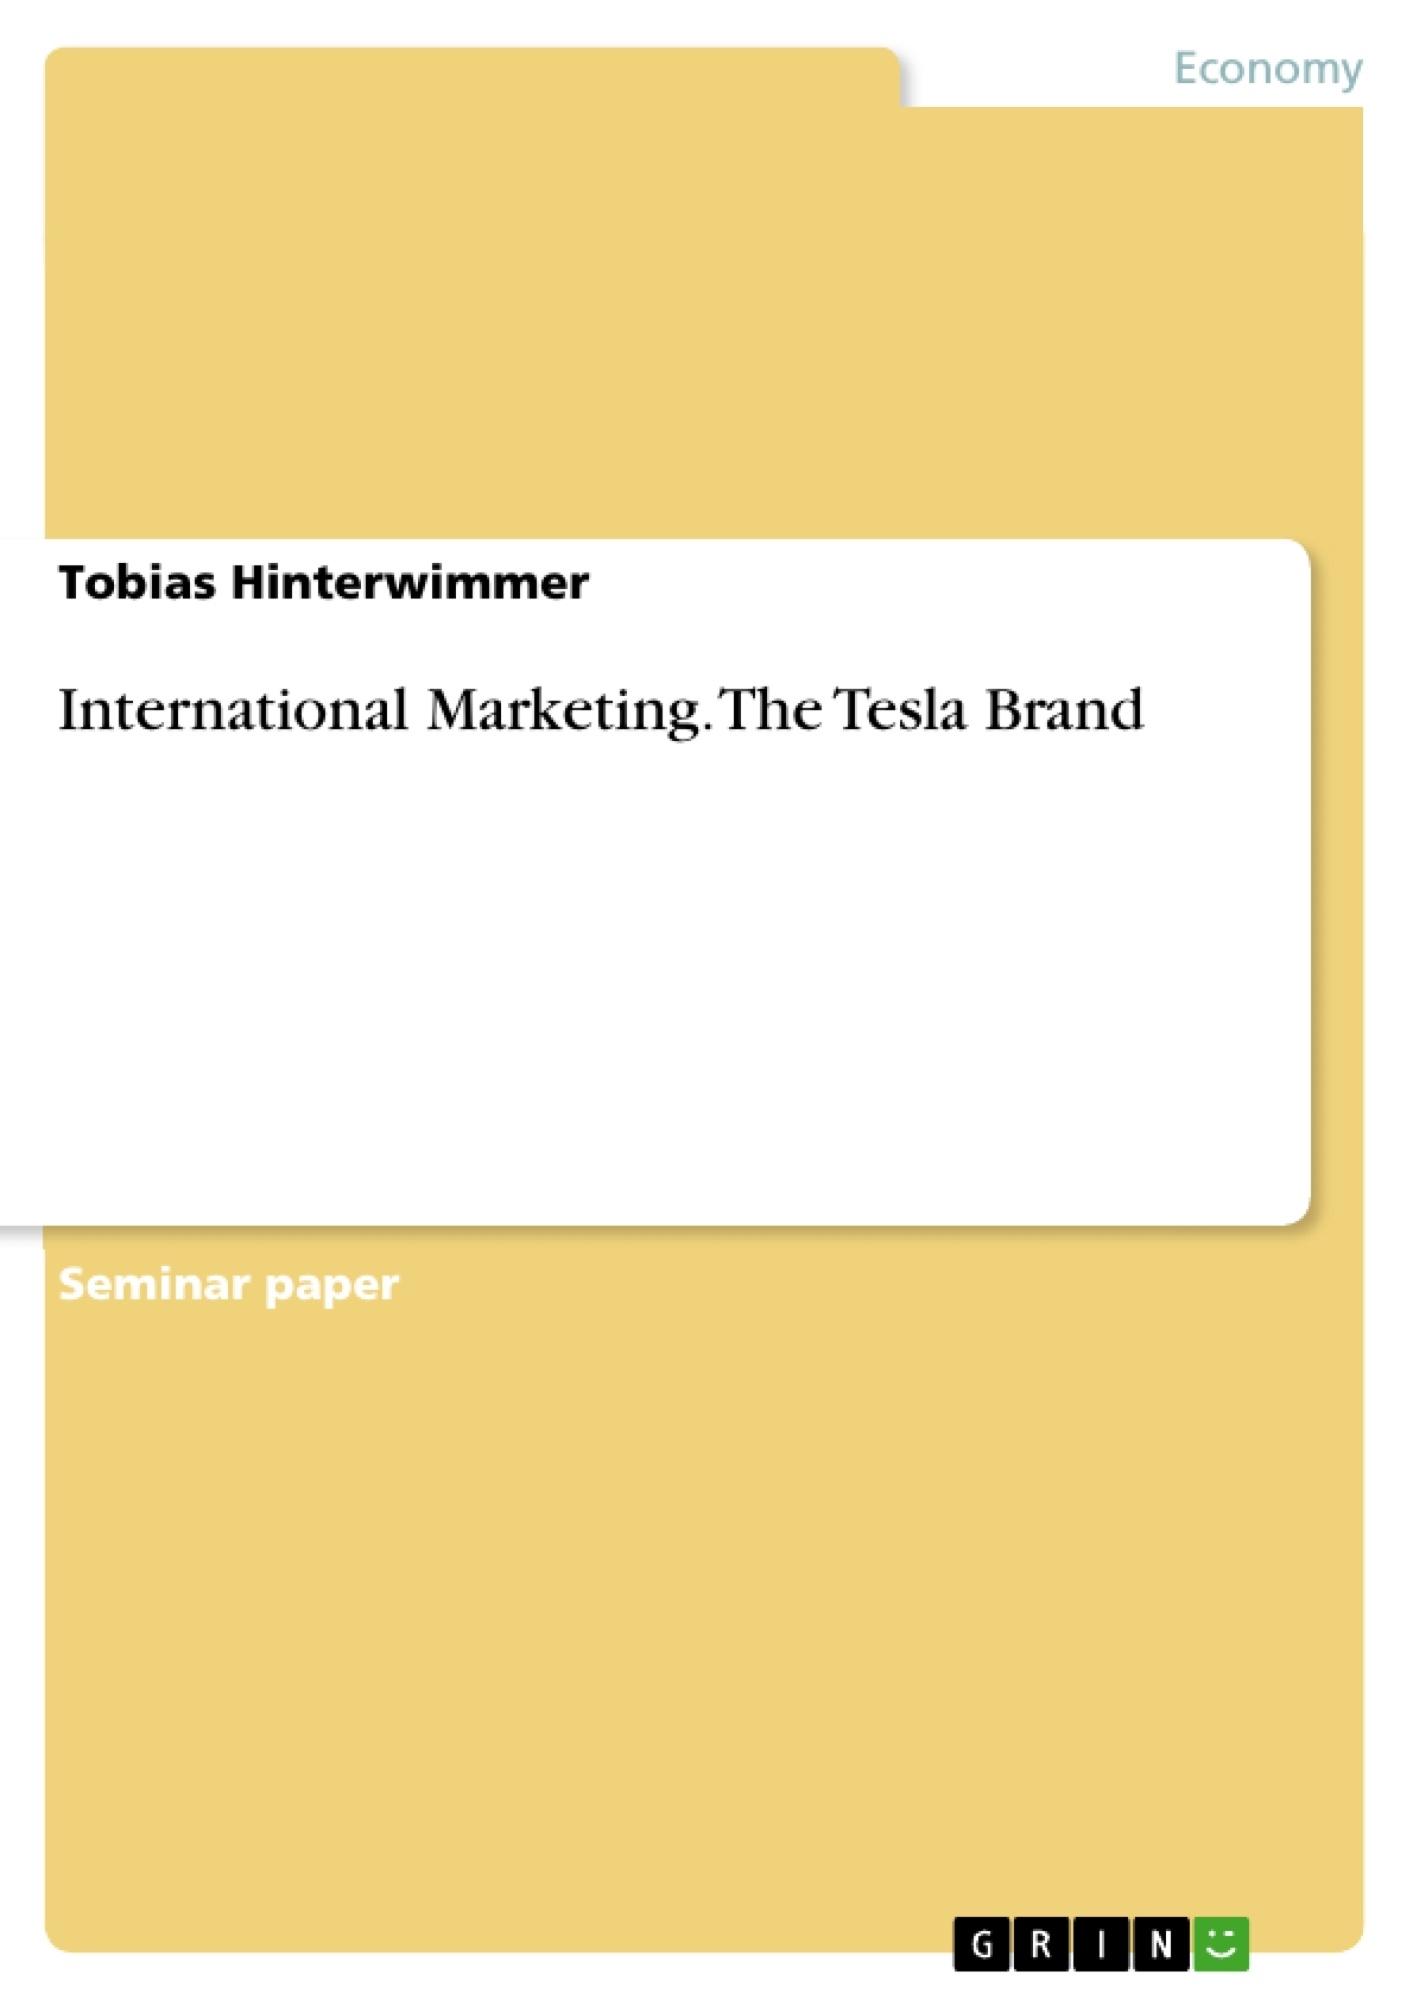 Title: International Marketing. The Tesla Brand